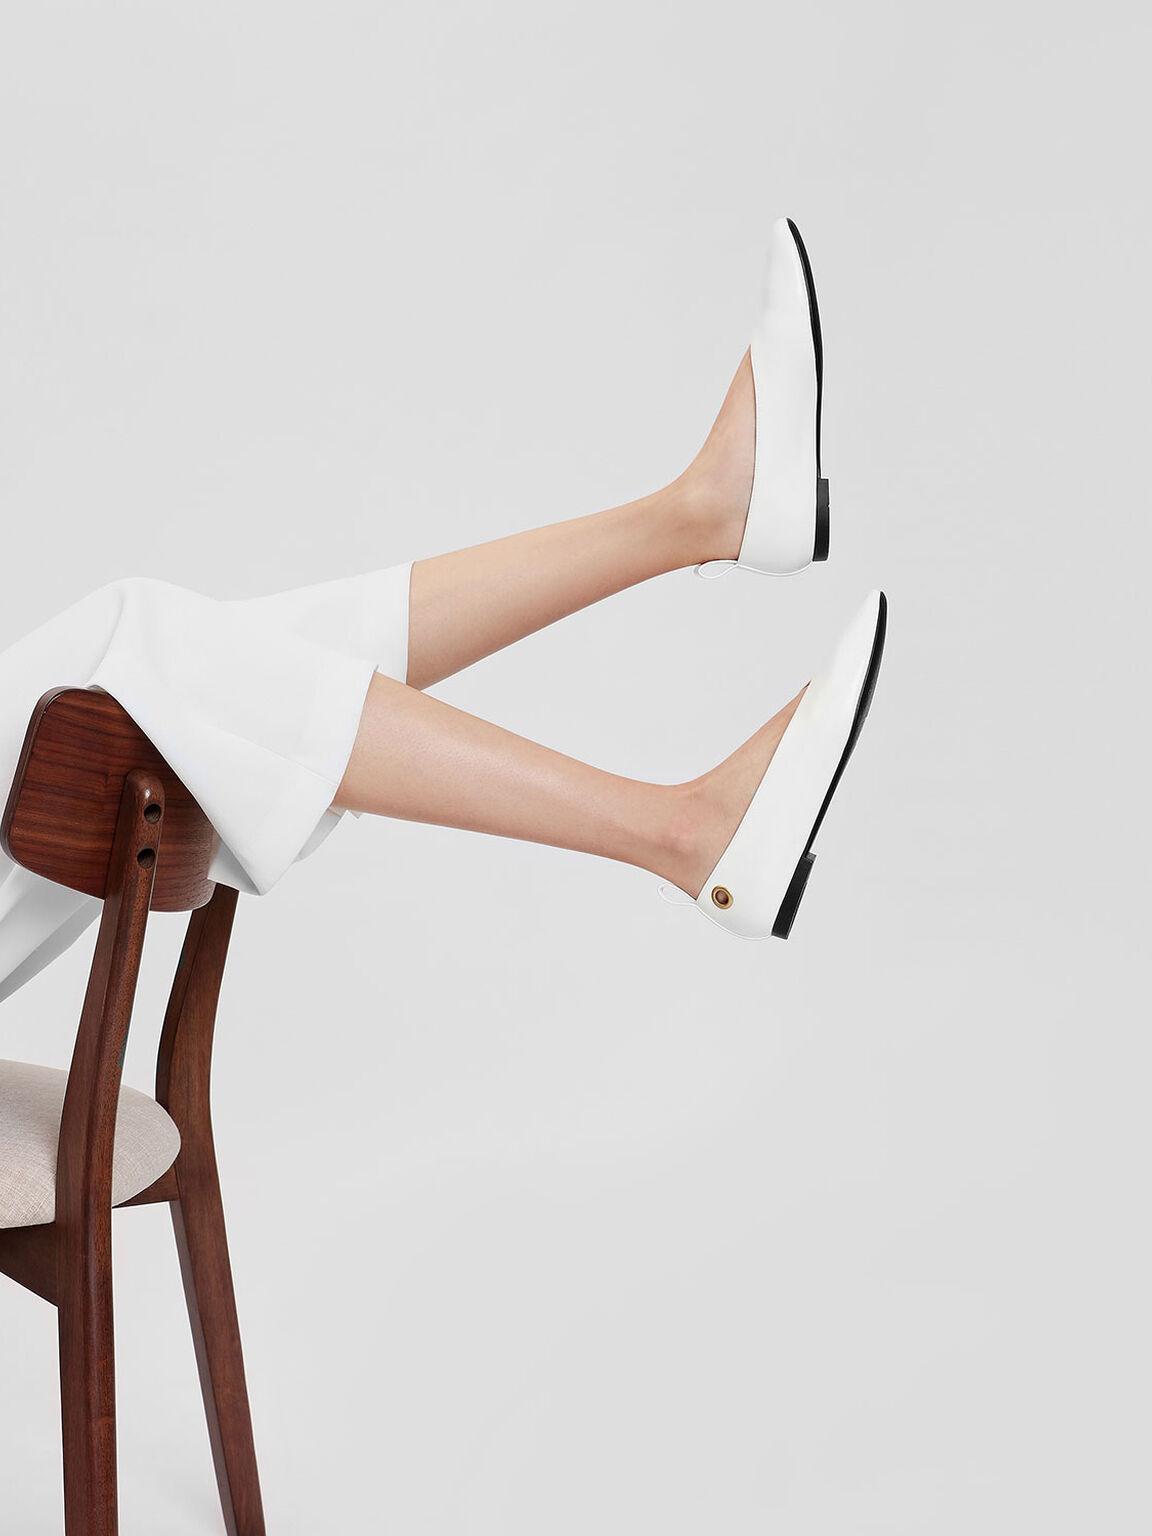 V Topline Ballerinas, White, hi-res